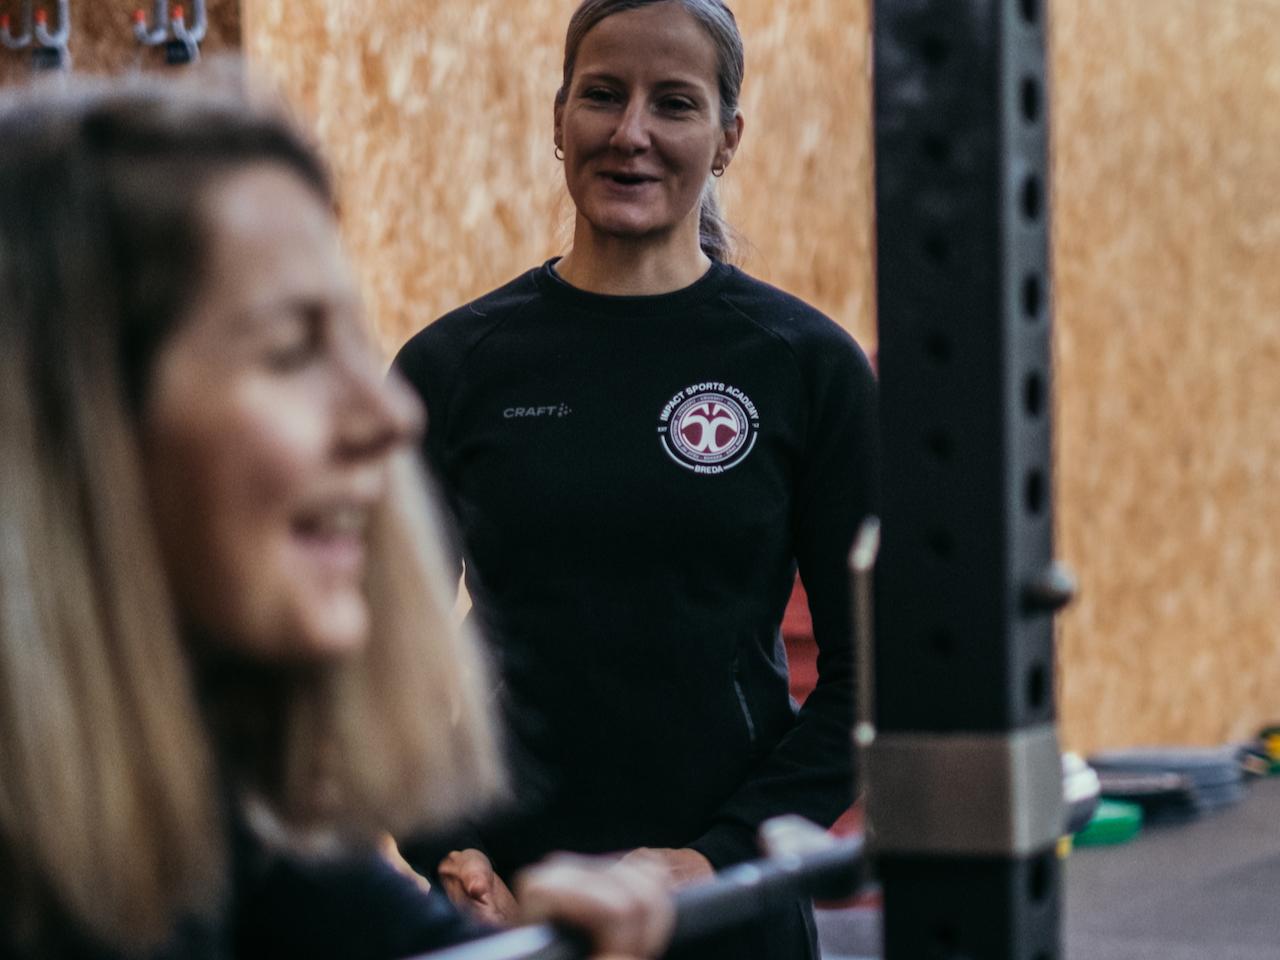 Trainen tijdens zwangerschap - personal training Impact Sports Academy te Breda